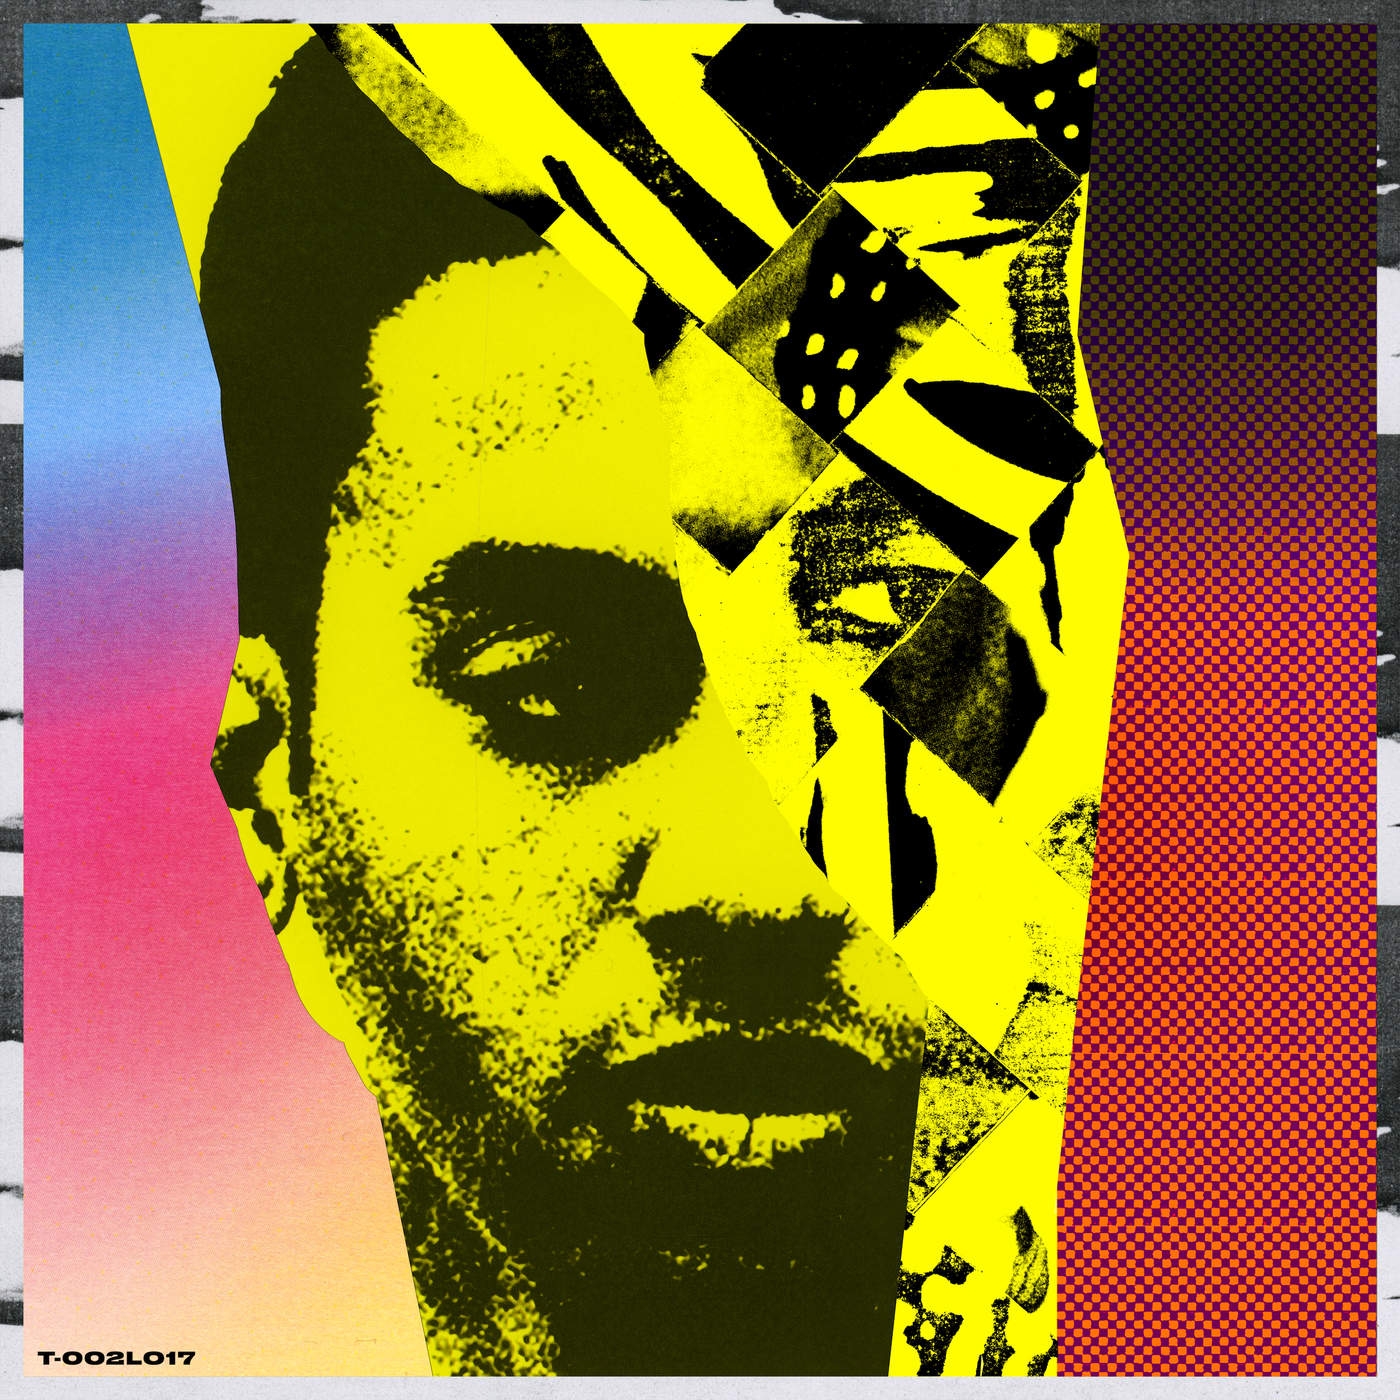 Lophiile - Off Top (with Freddie Gibbs) - Single